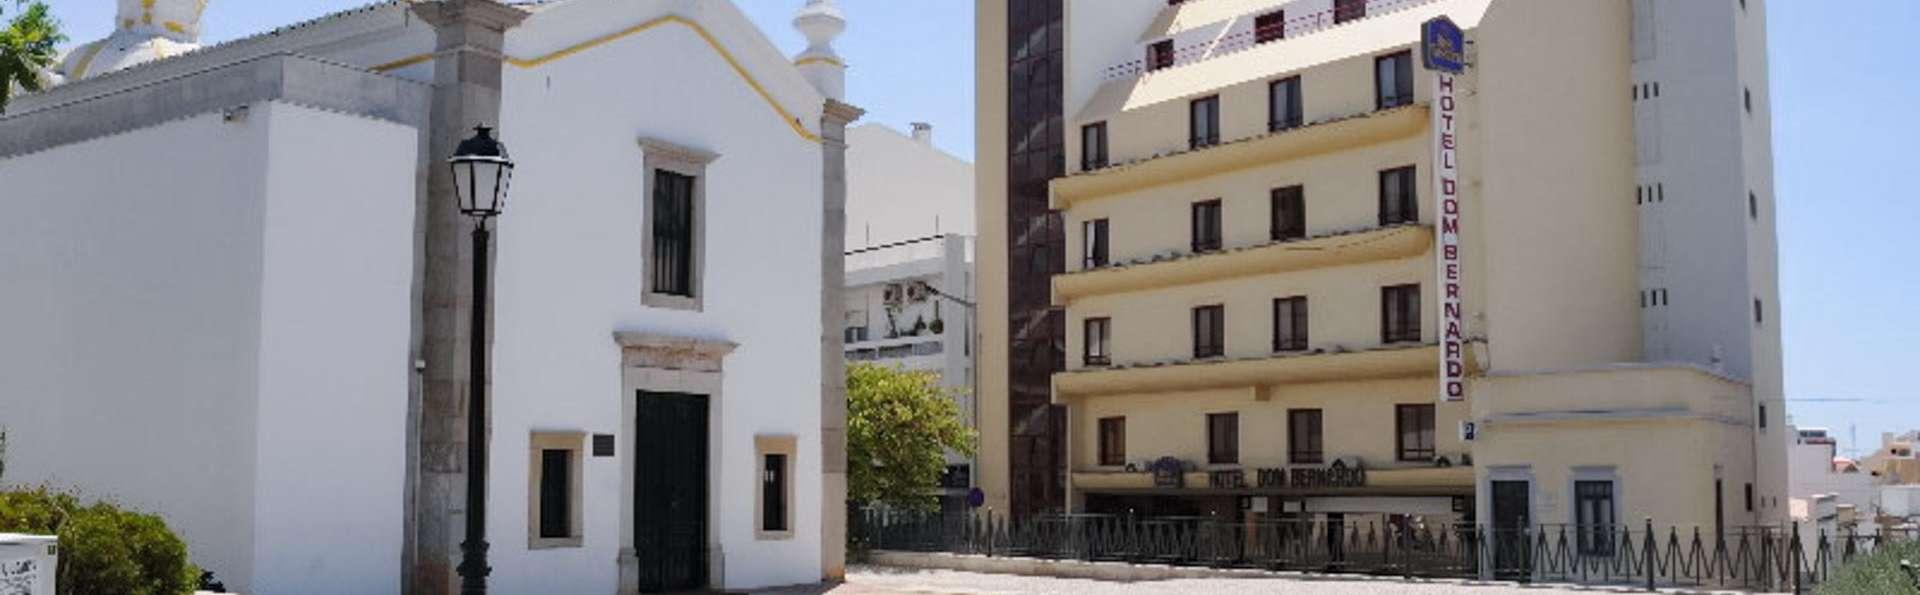 Best Western Hotel Dom Bernardo - EDIT_FRONT_01.jpg